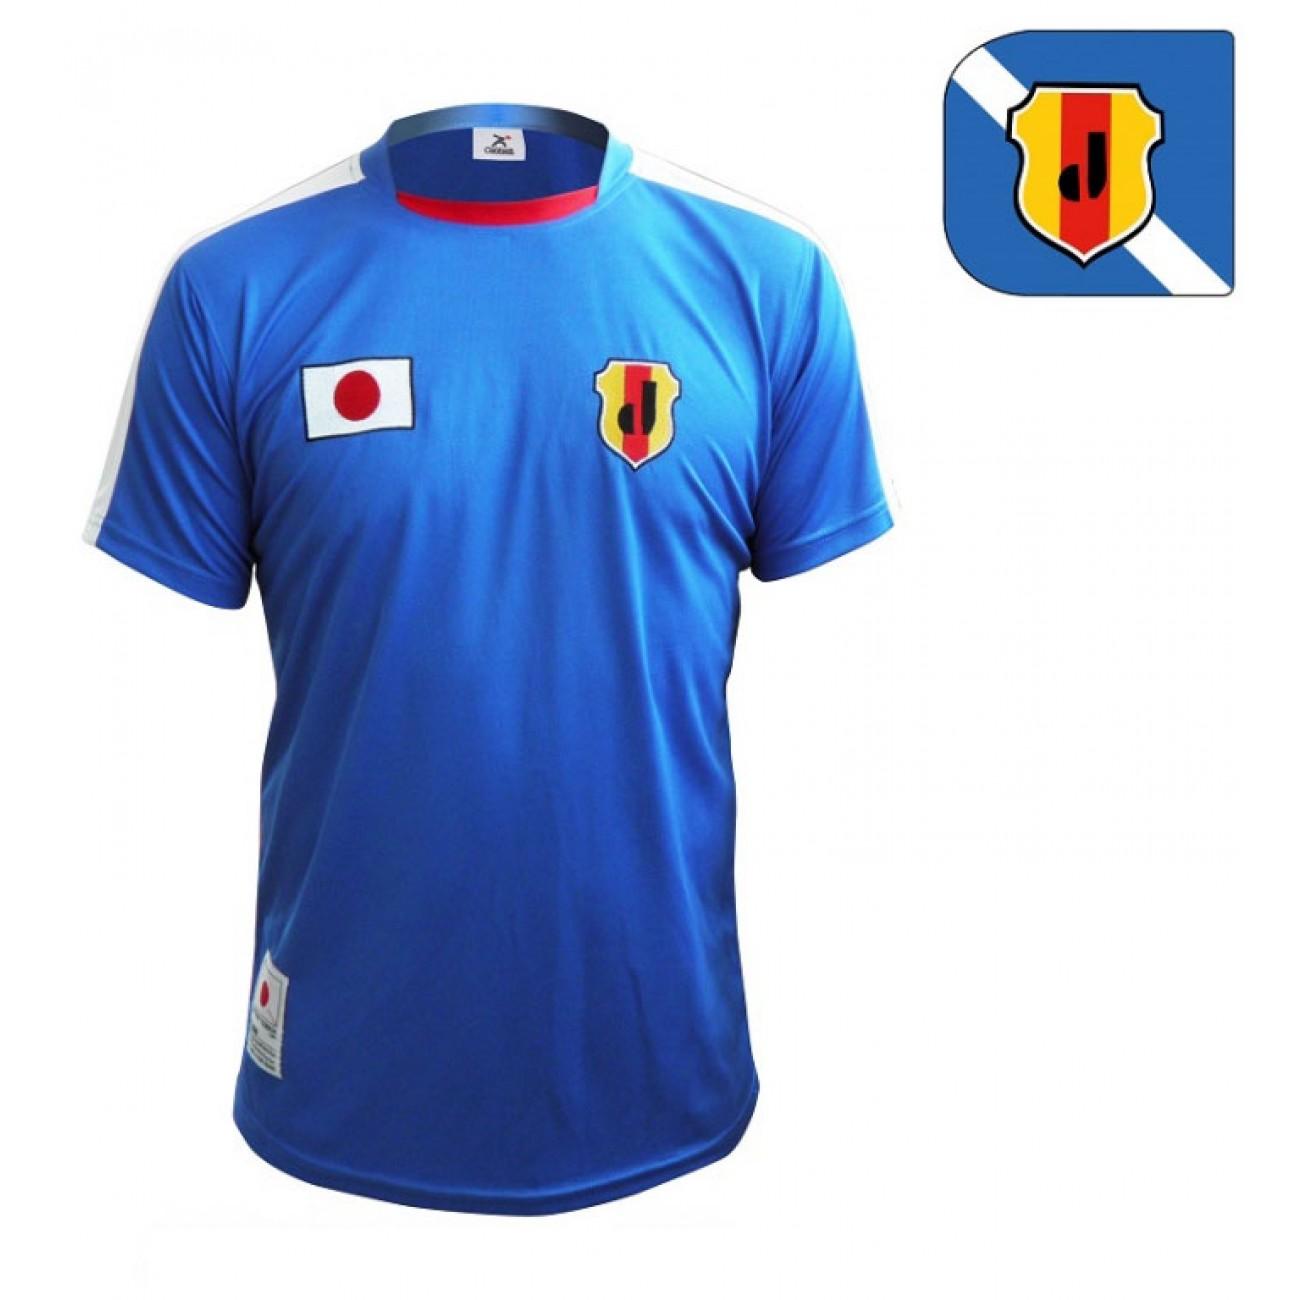 http://www.retrofootball.es/ropa-de-futbol/camiseta-tsubasa-japon.html